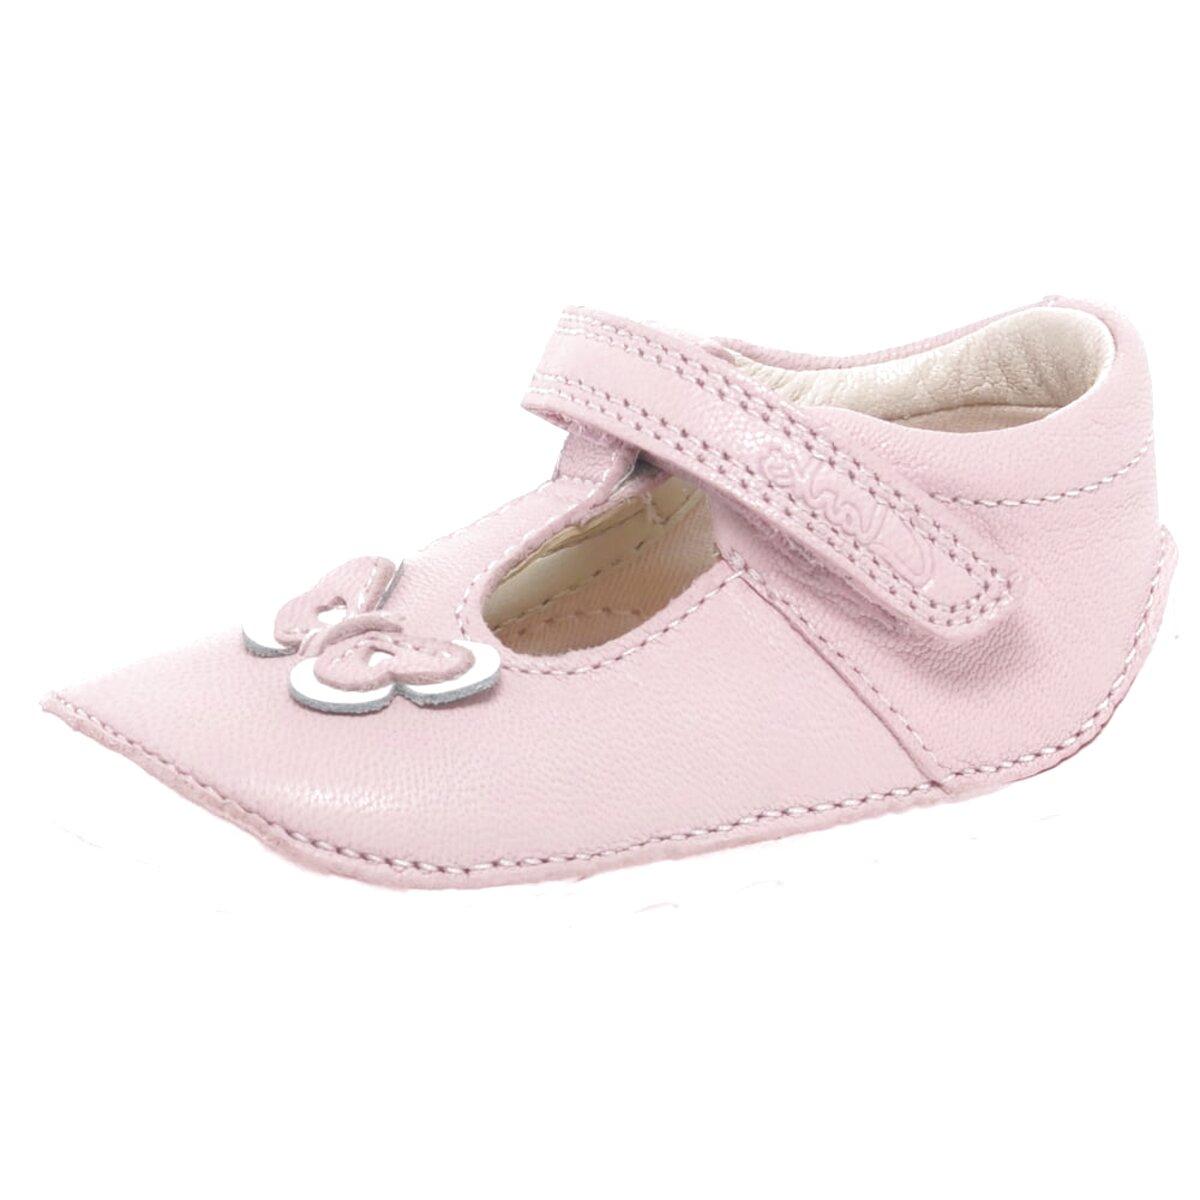 Clarks Pre Walker Shoes for sale in UK